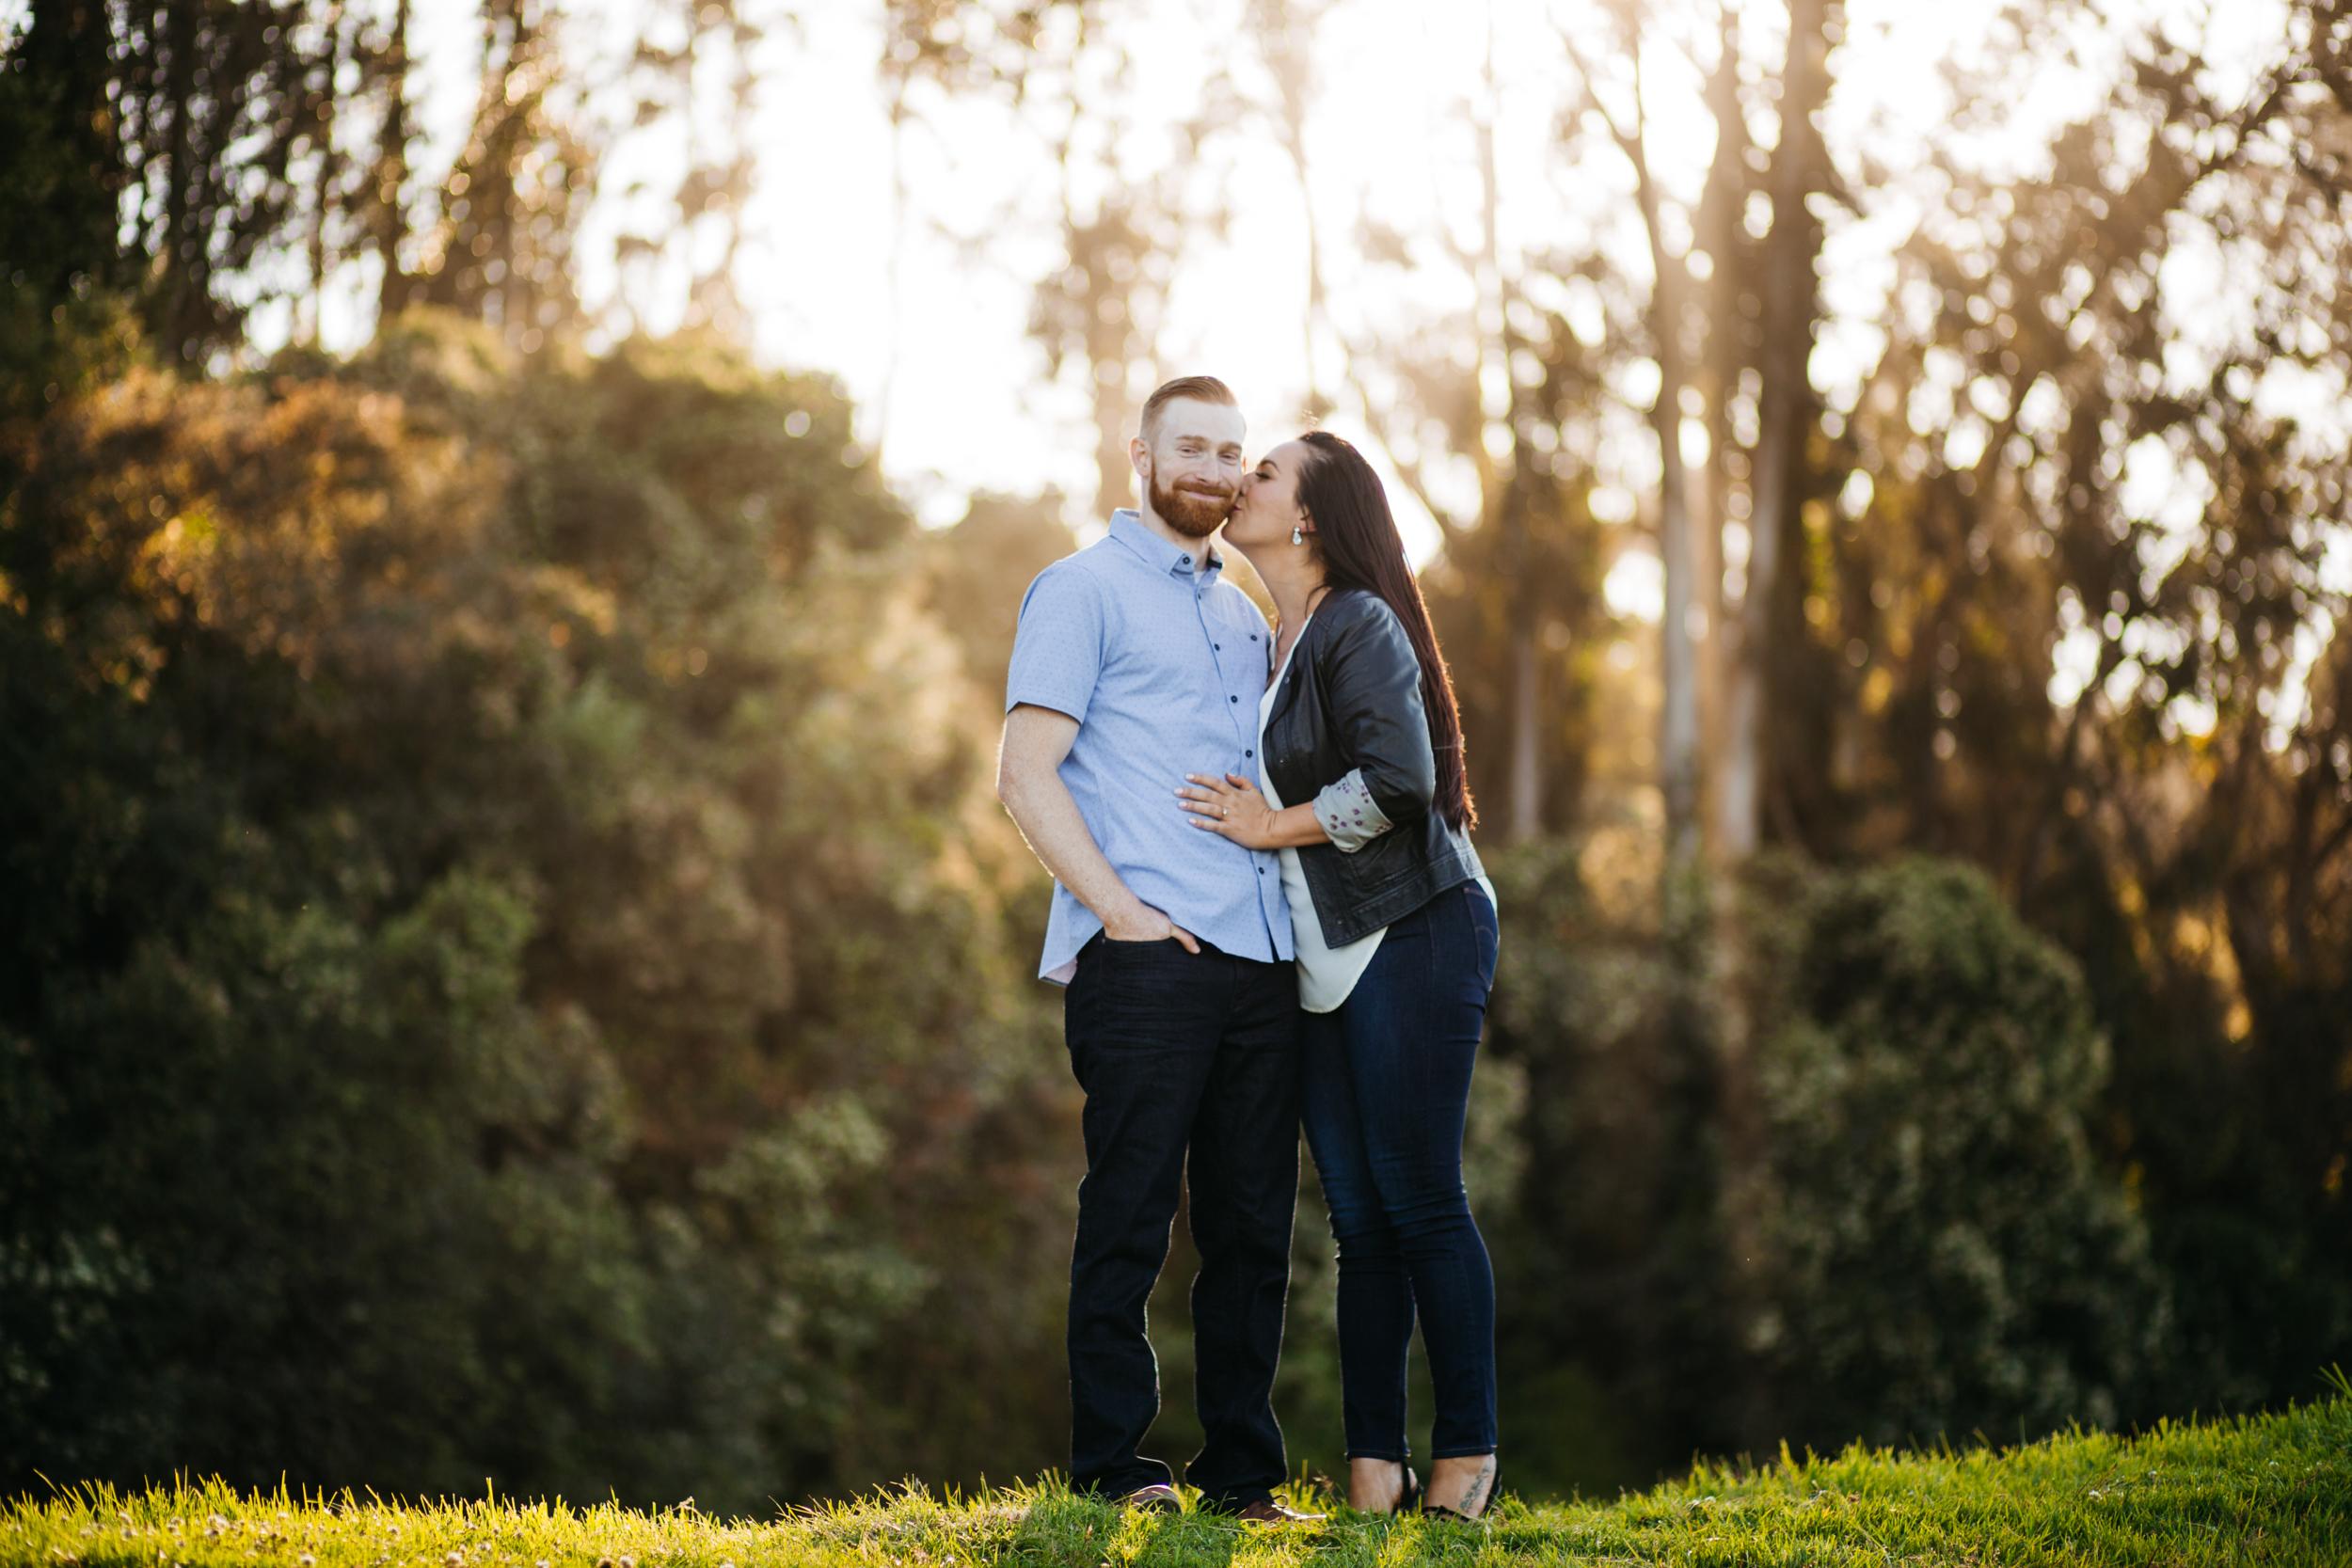 Engagement Photos-San Fransisco-Golden Gate Park-Ranalla Photo & Films-28.jpg